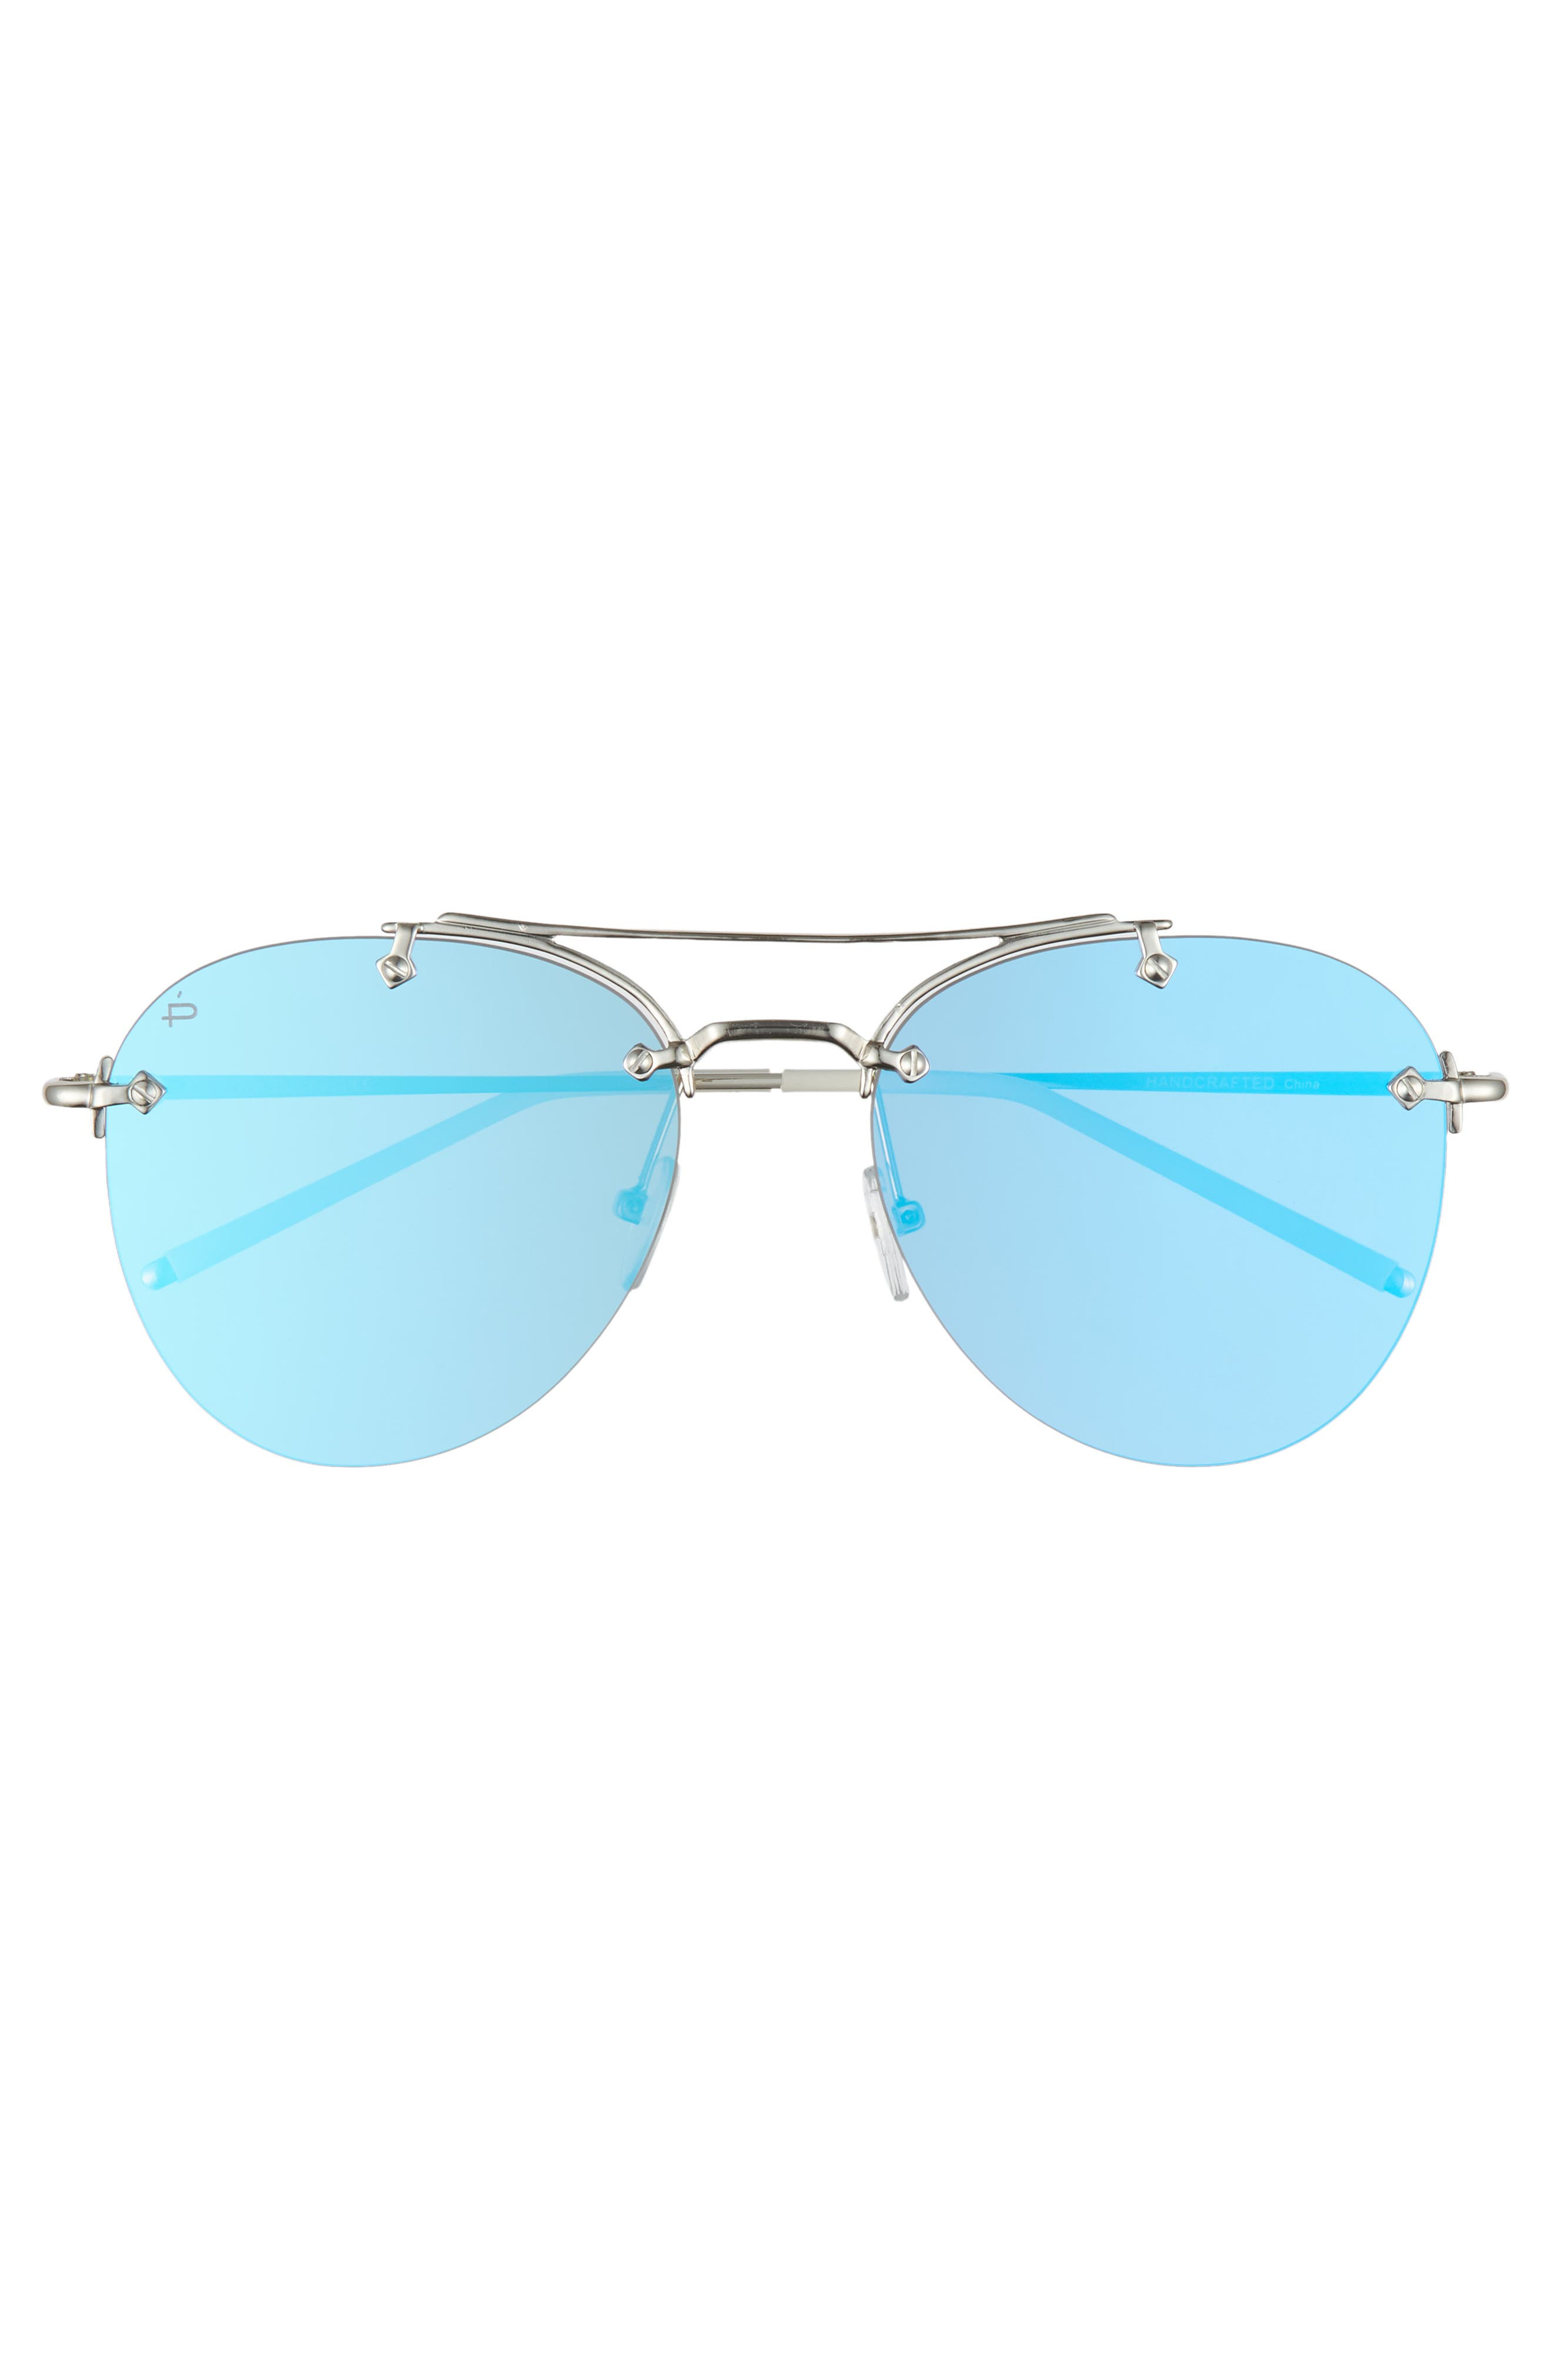 Privé Revaux The Dutchess 57mm Aviator Sunglasses,                             Alternate thumbnail 3, color,                             Silver